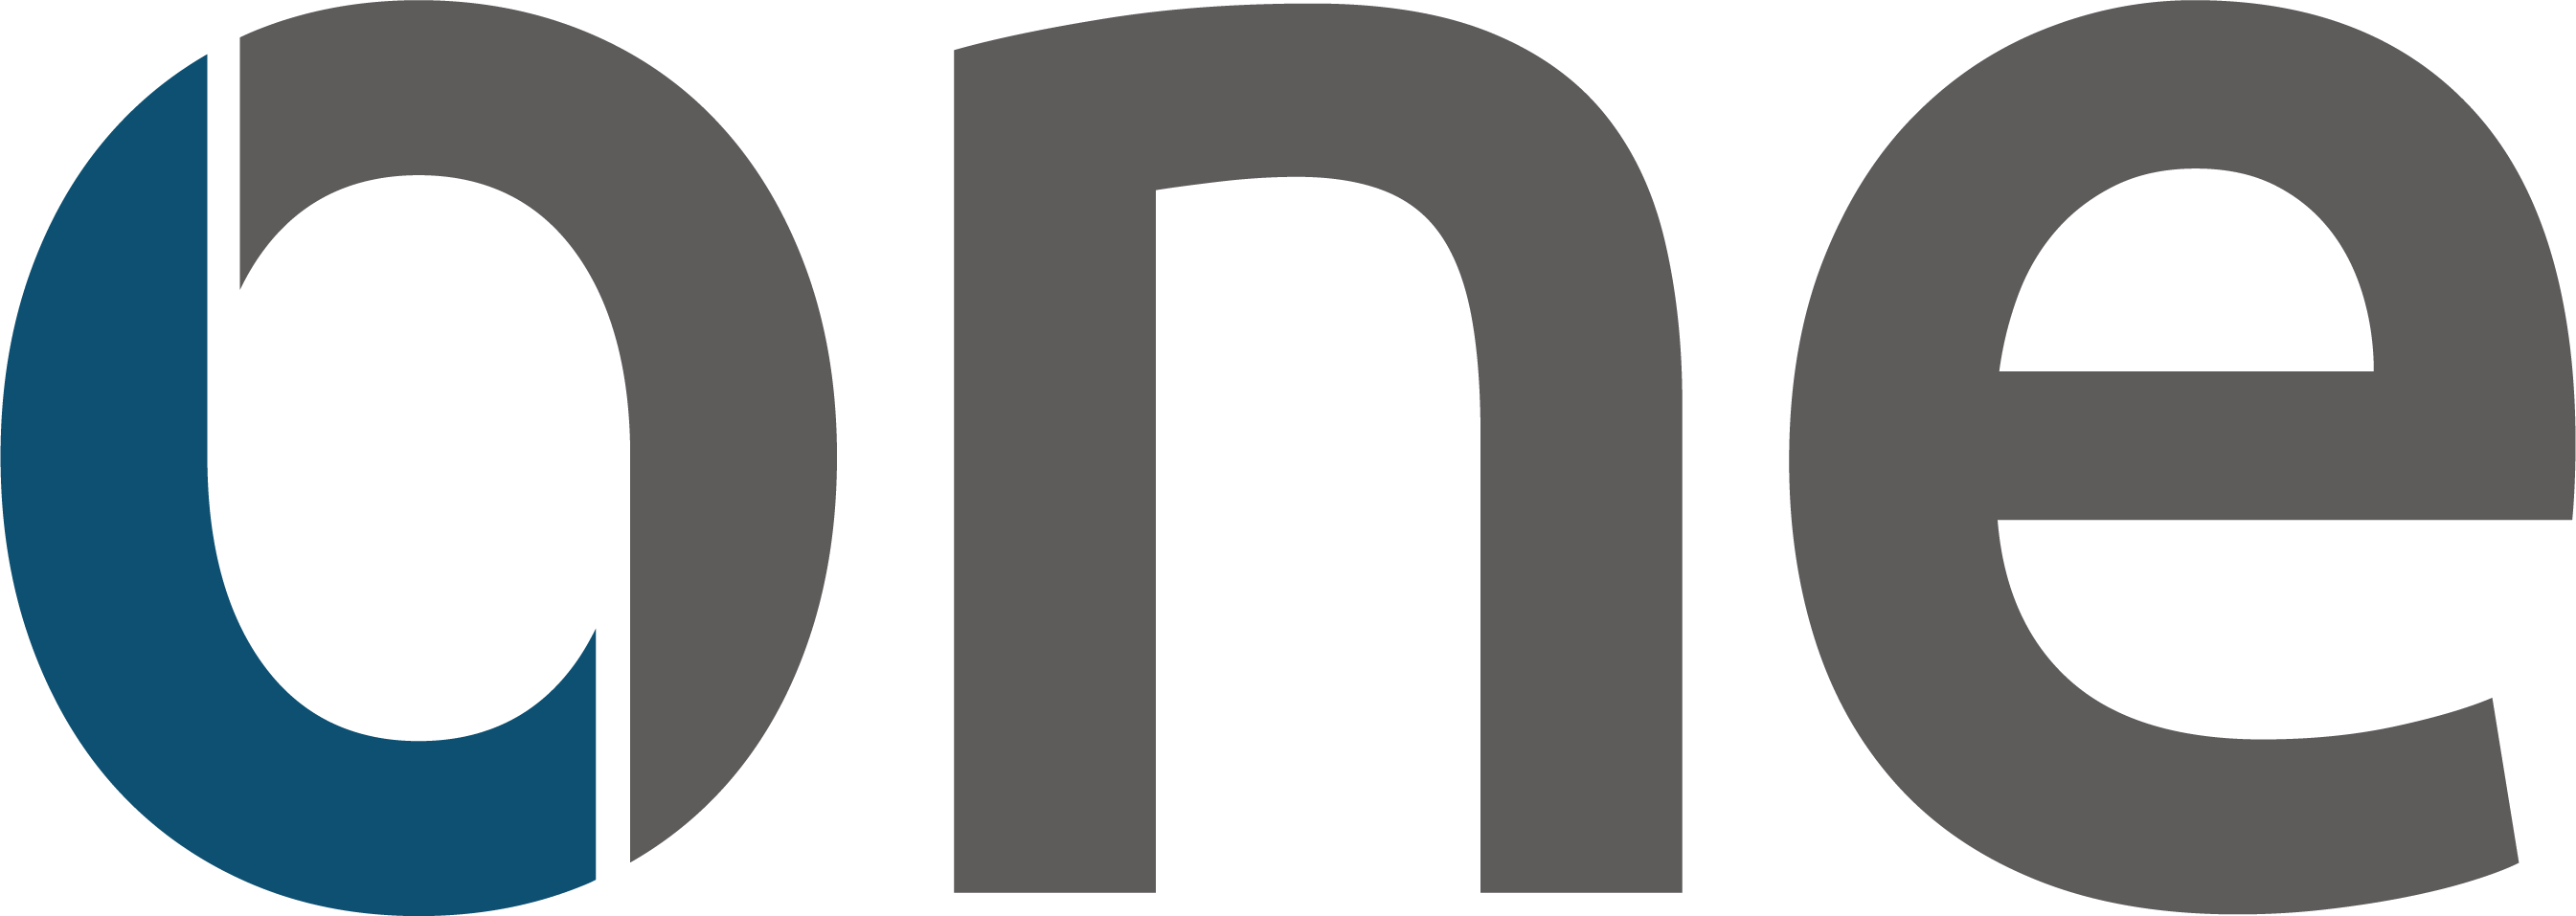 Logo S3 Kassensysteme